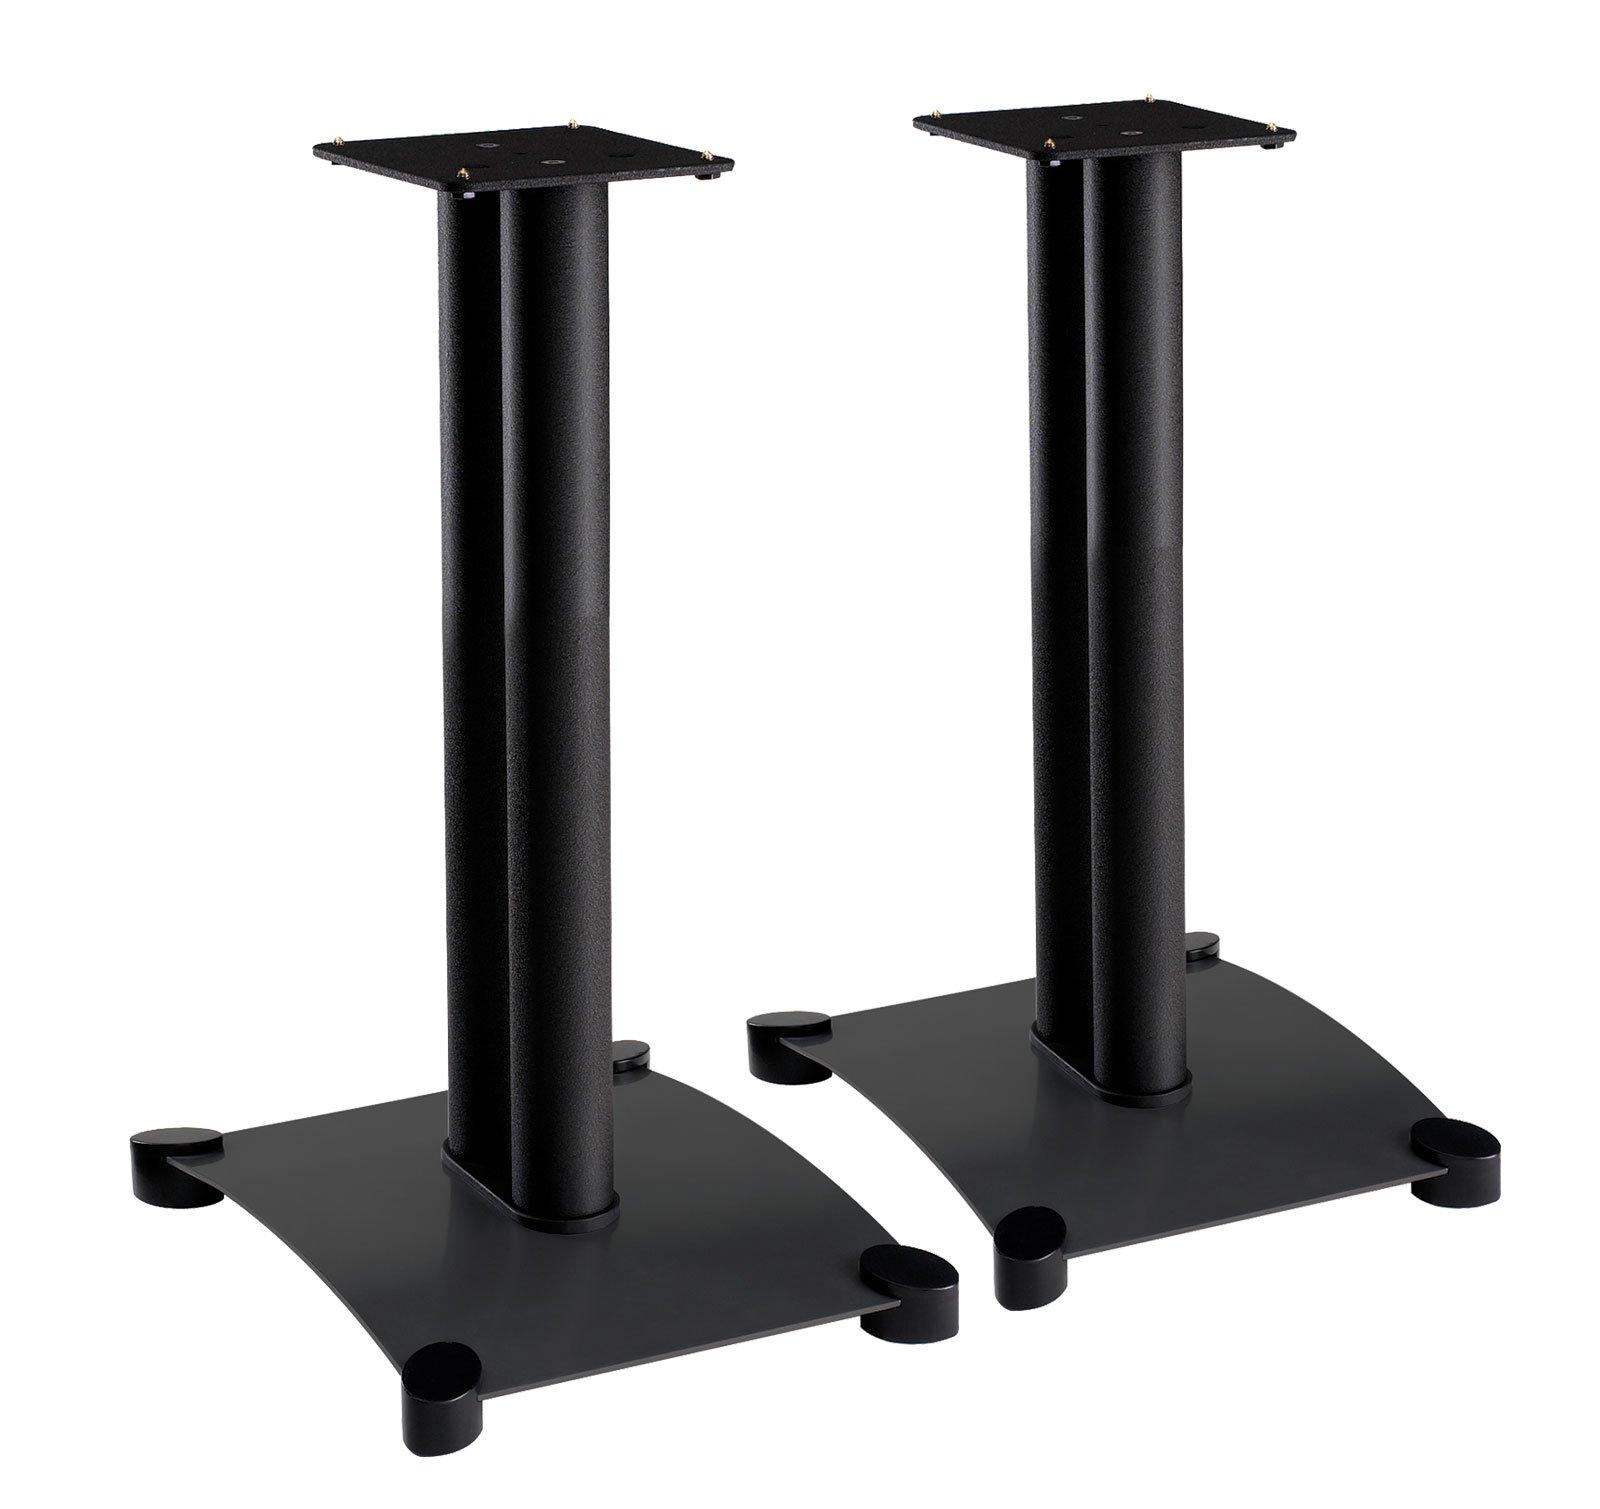 Sanus Steel Series 22'' Speaker Stands for Medium to Large Bookshelf Speakers - SF22-B1